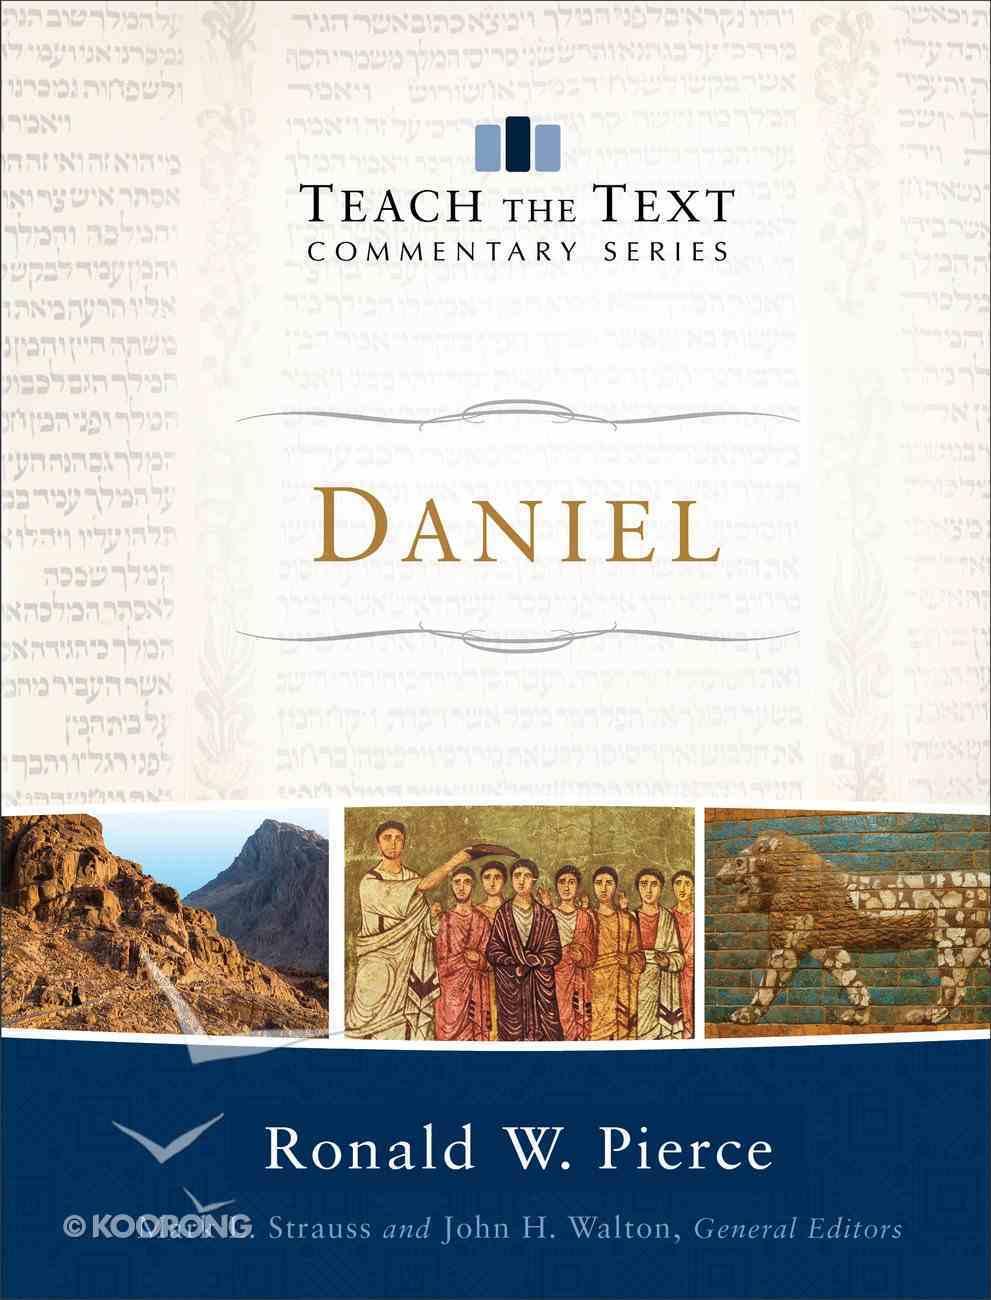 Daniel (Teach The Text Commentary Series) eBook